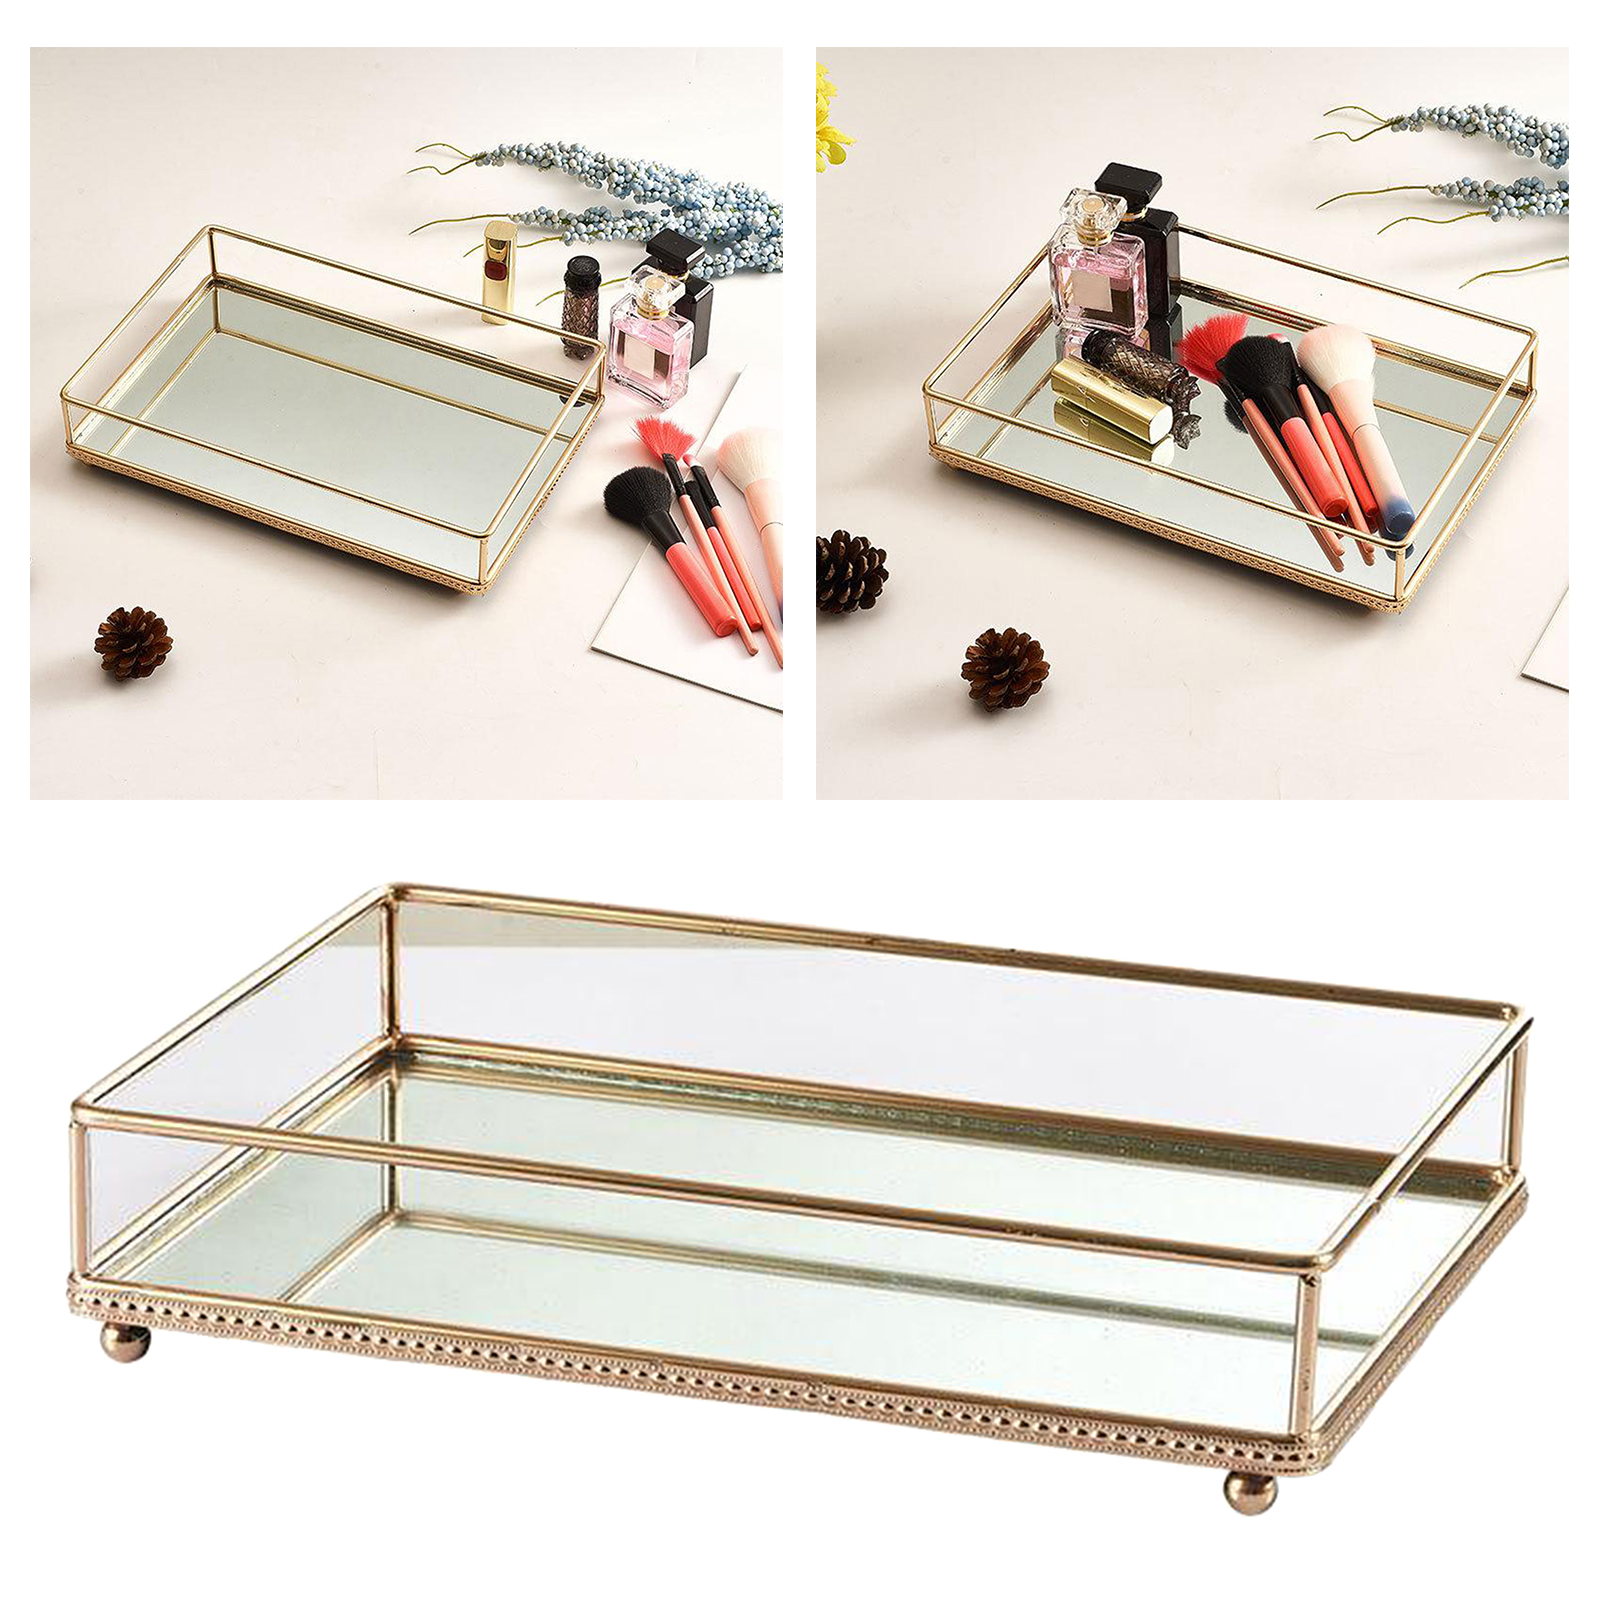 Mirror Glass Mirrored Tray Desk Decorative Vanity Tray Jewelry Perfume Organizer Makeup Tray For Dresser Bathroom Bedroom Best Discount 4b326 Goteborgsaventyrscenter